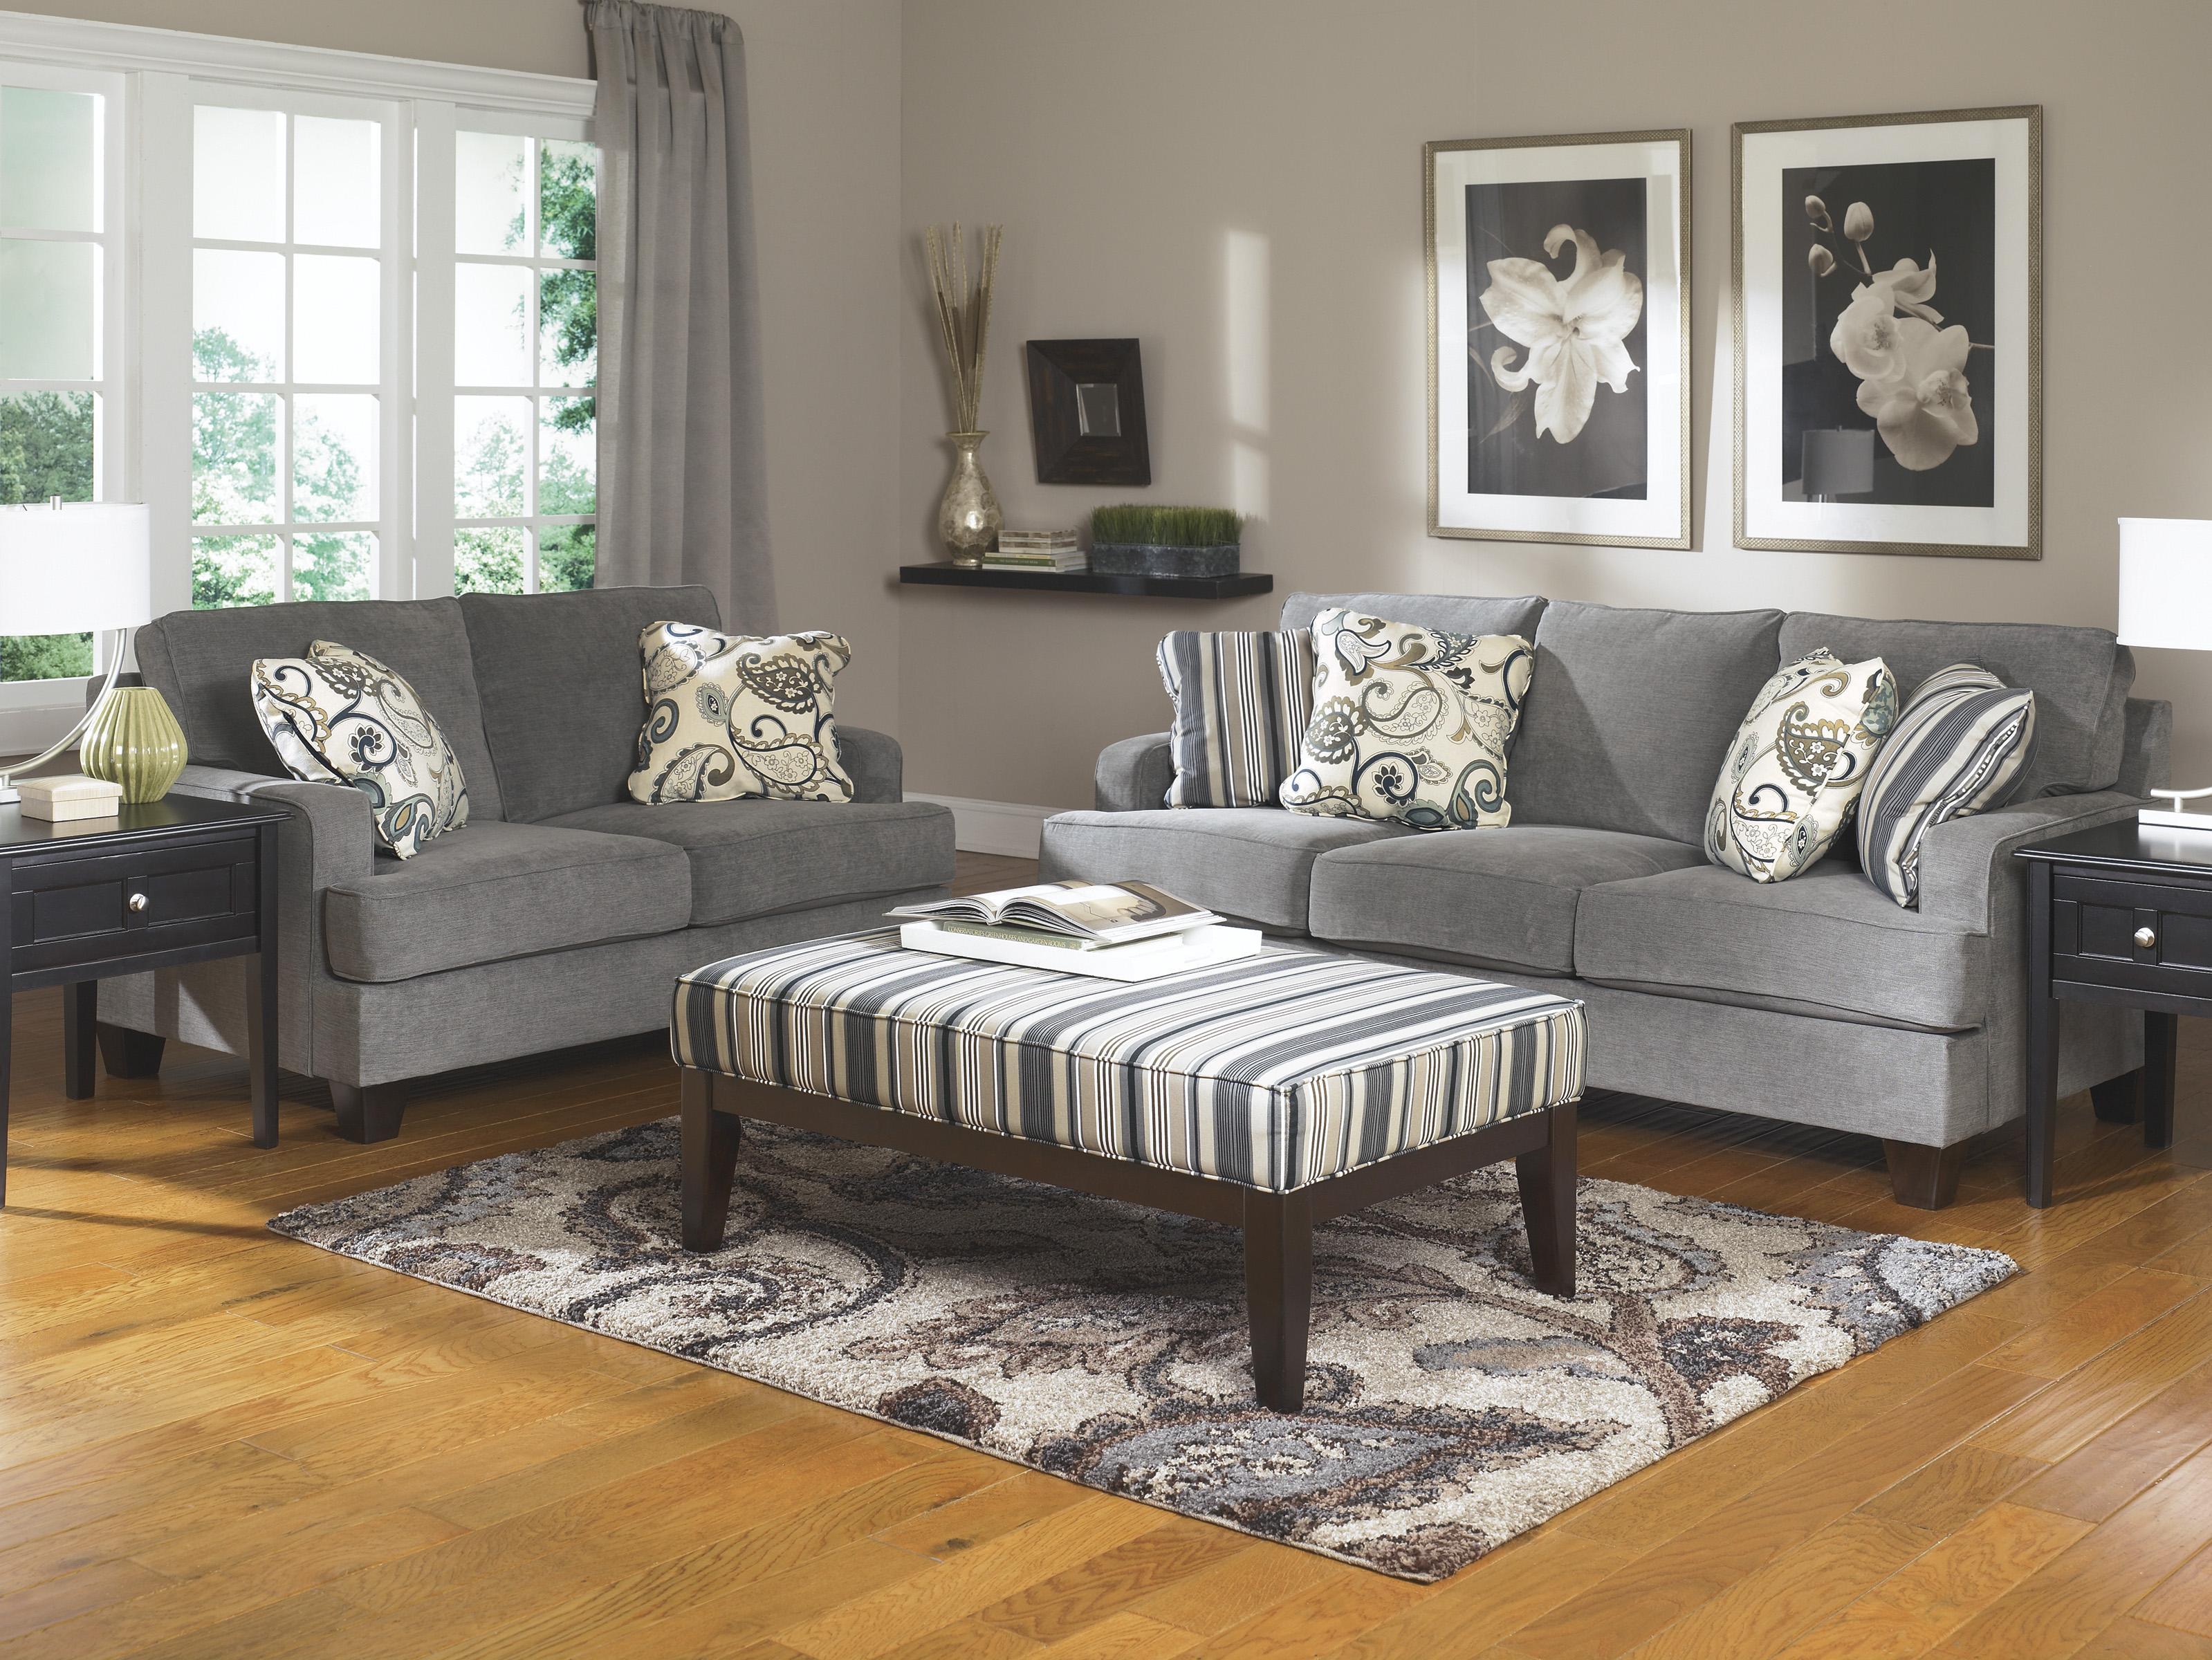 Ashley Furniture Yvette - Steel Stationary Living Room Group - Item Number: 77900 Living Room Group 2